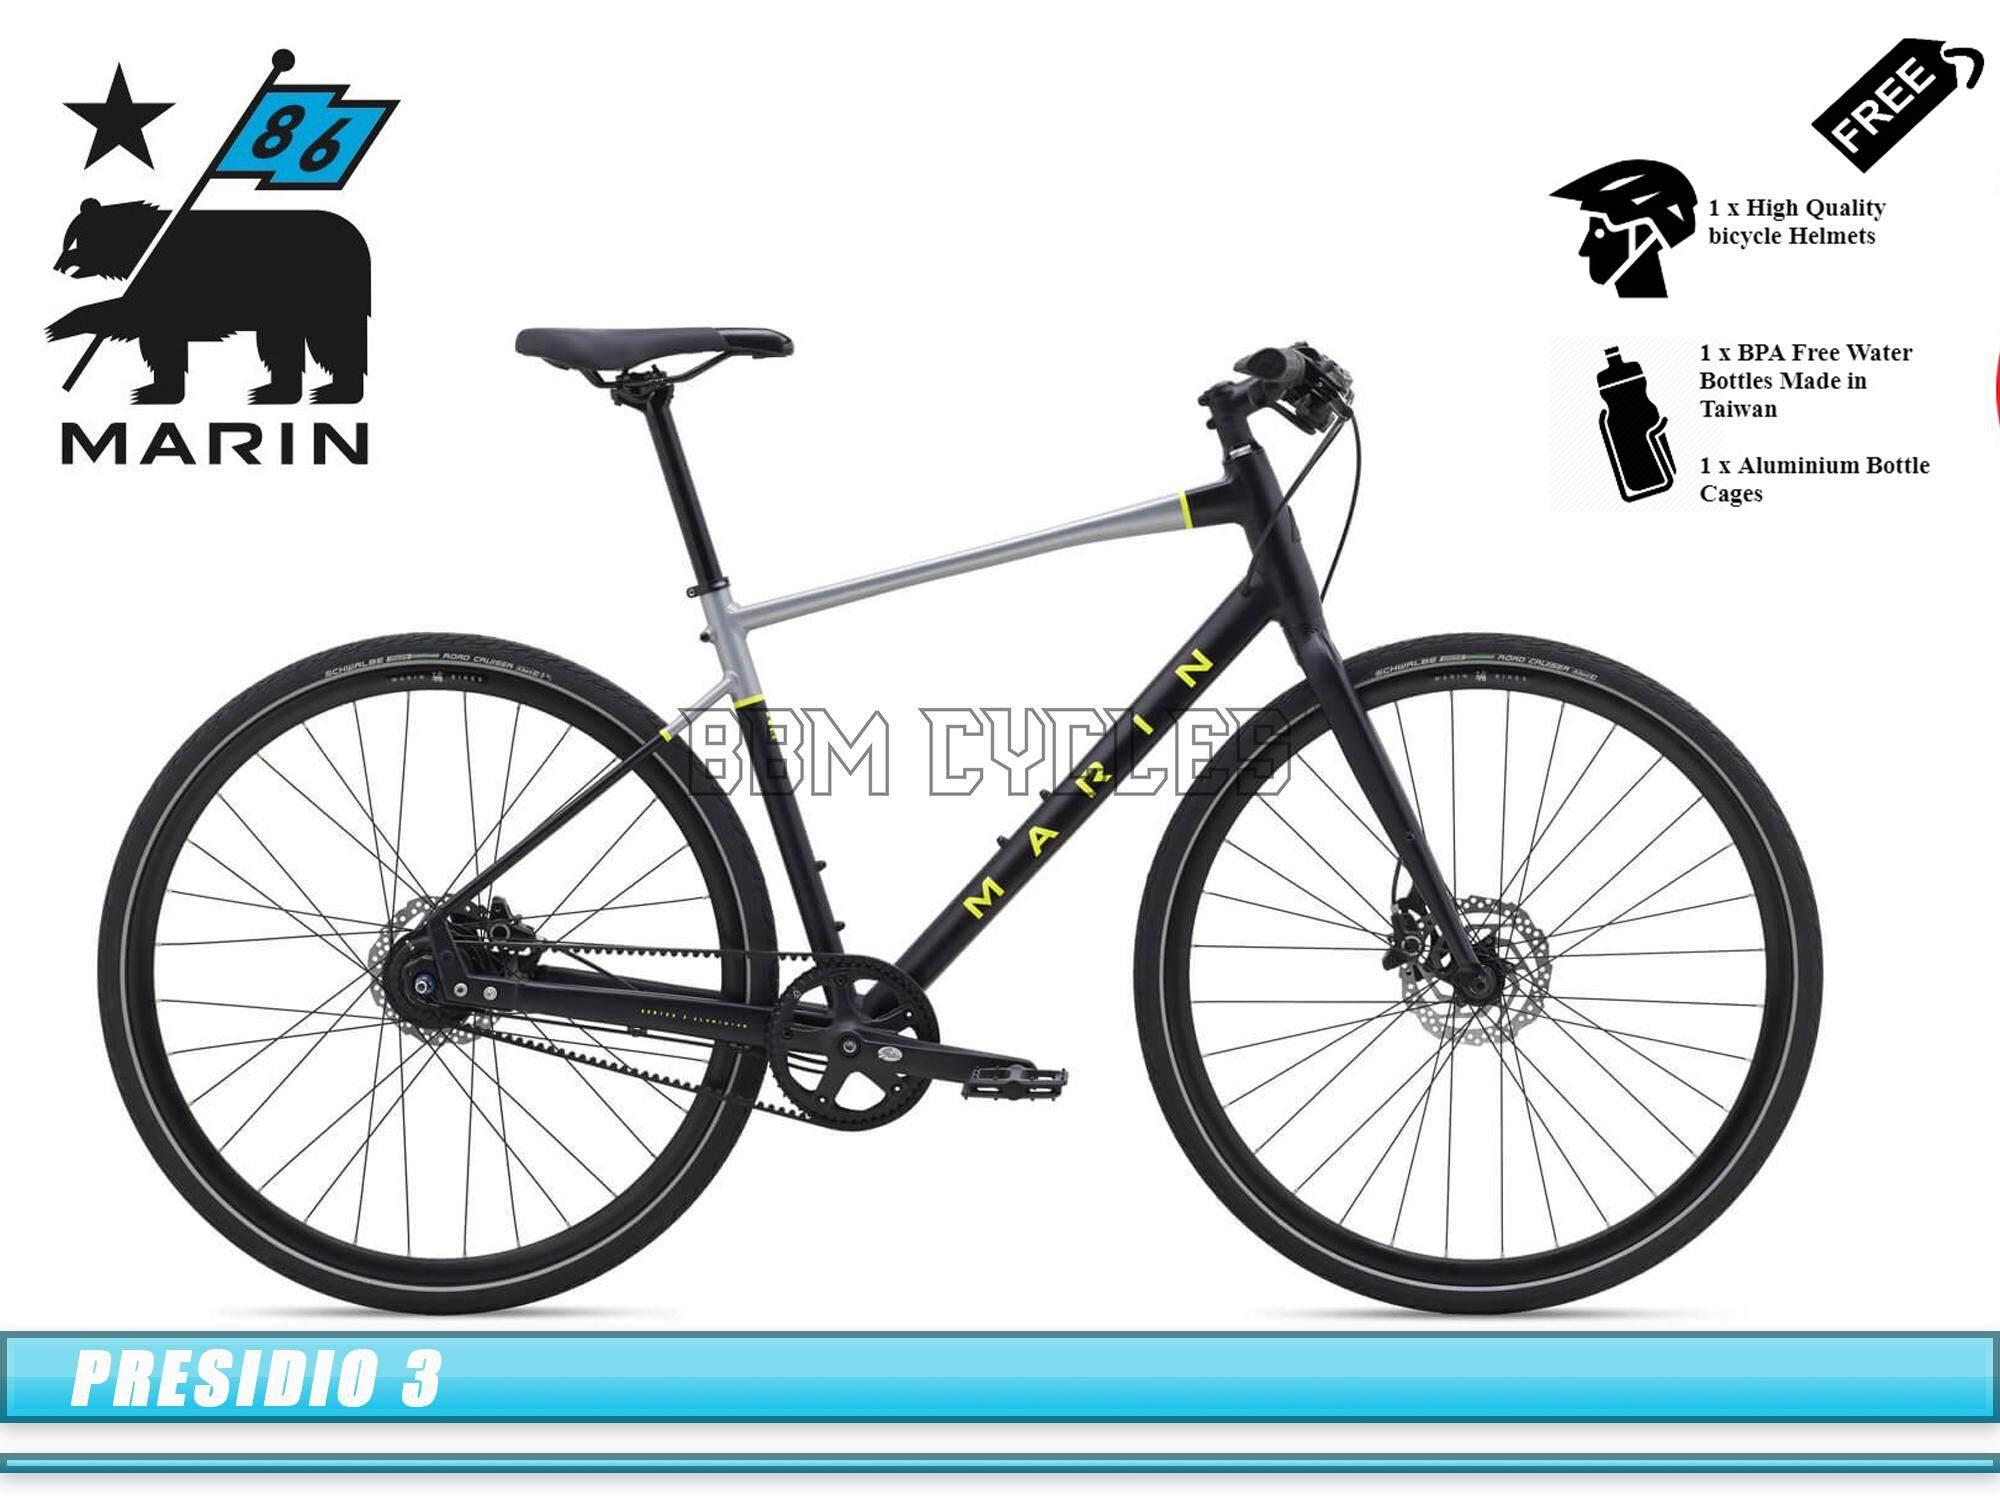 d1a11690cdb 2019 Marin Presidio 3 - Carbon Belt Drive City Commuter Bike bicycle urban bikes  Marin Bikes